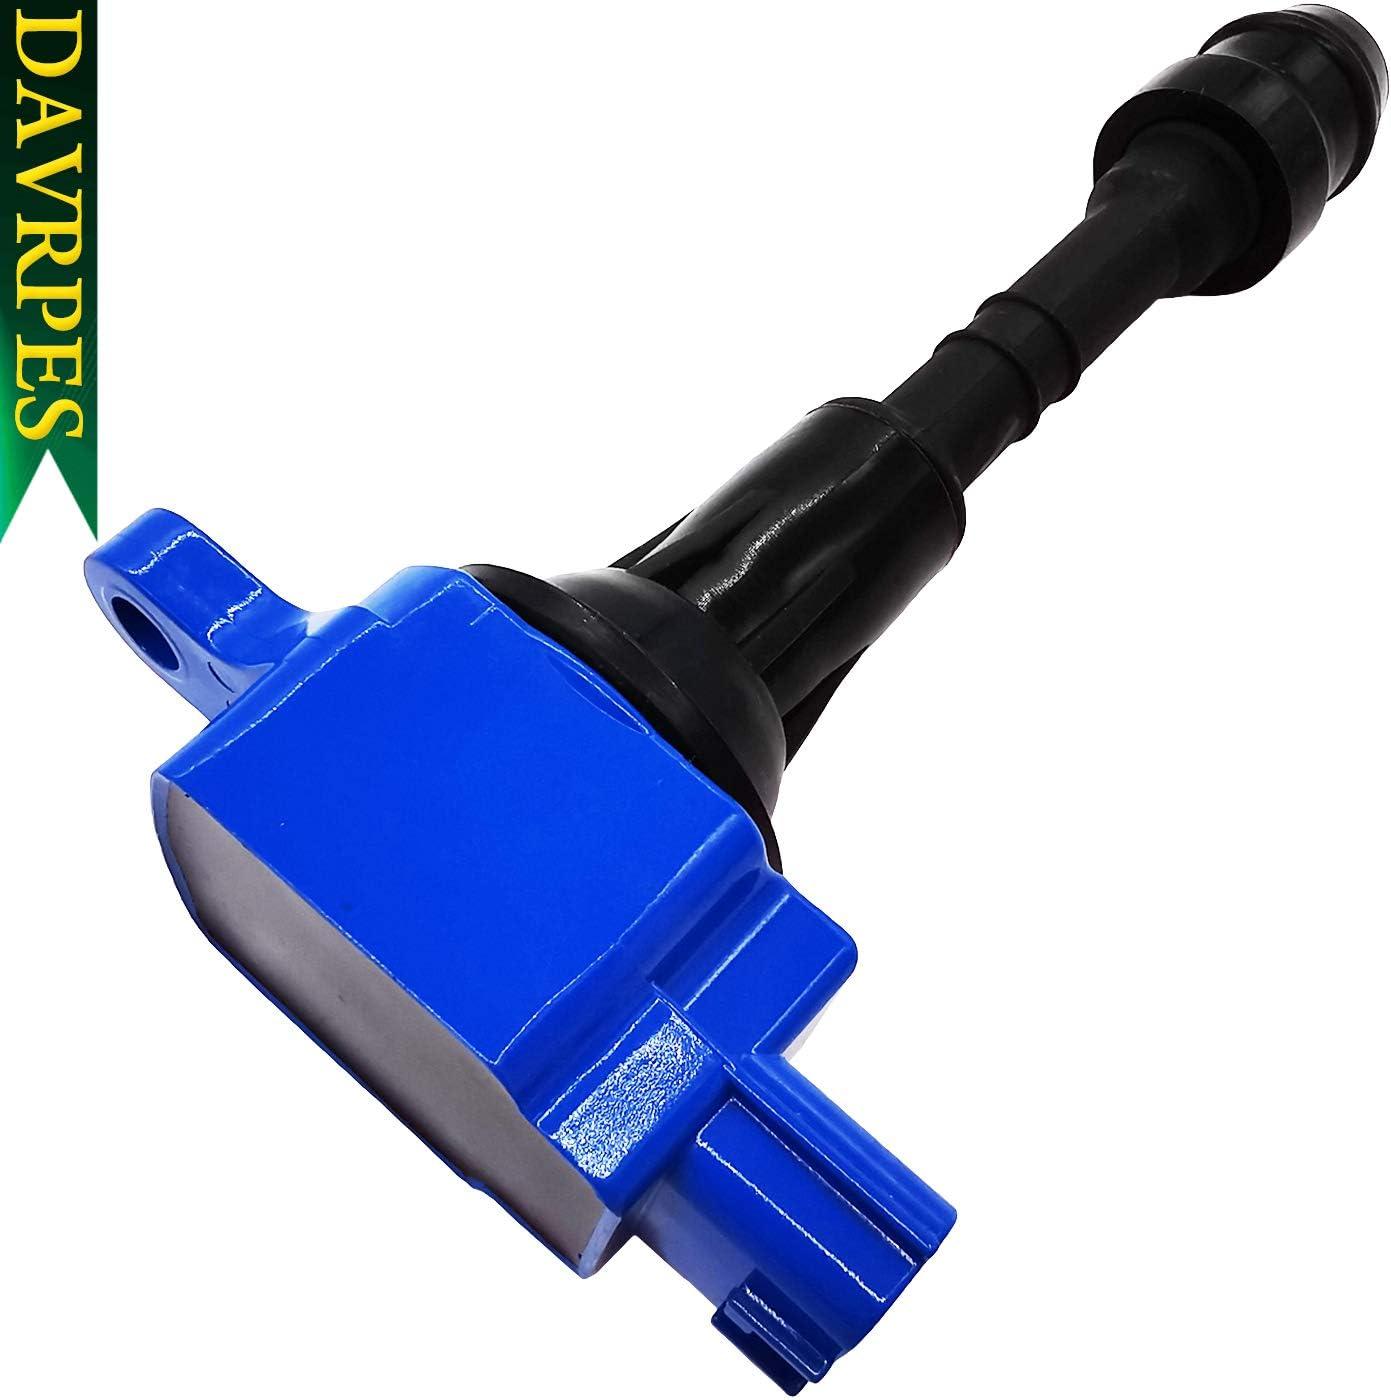 2004-2007 Titan 5.6L-V8 Replace# C1483 22448-7S015 E1010 52-1802 DAVRPES UF510 Ignition Coils Packs For 2004-2006 Infiniti QX56 5.6L-V8 2004 Pathfinder 2005-2006 Armada 5.6L-V8